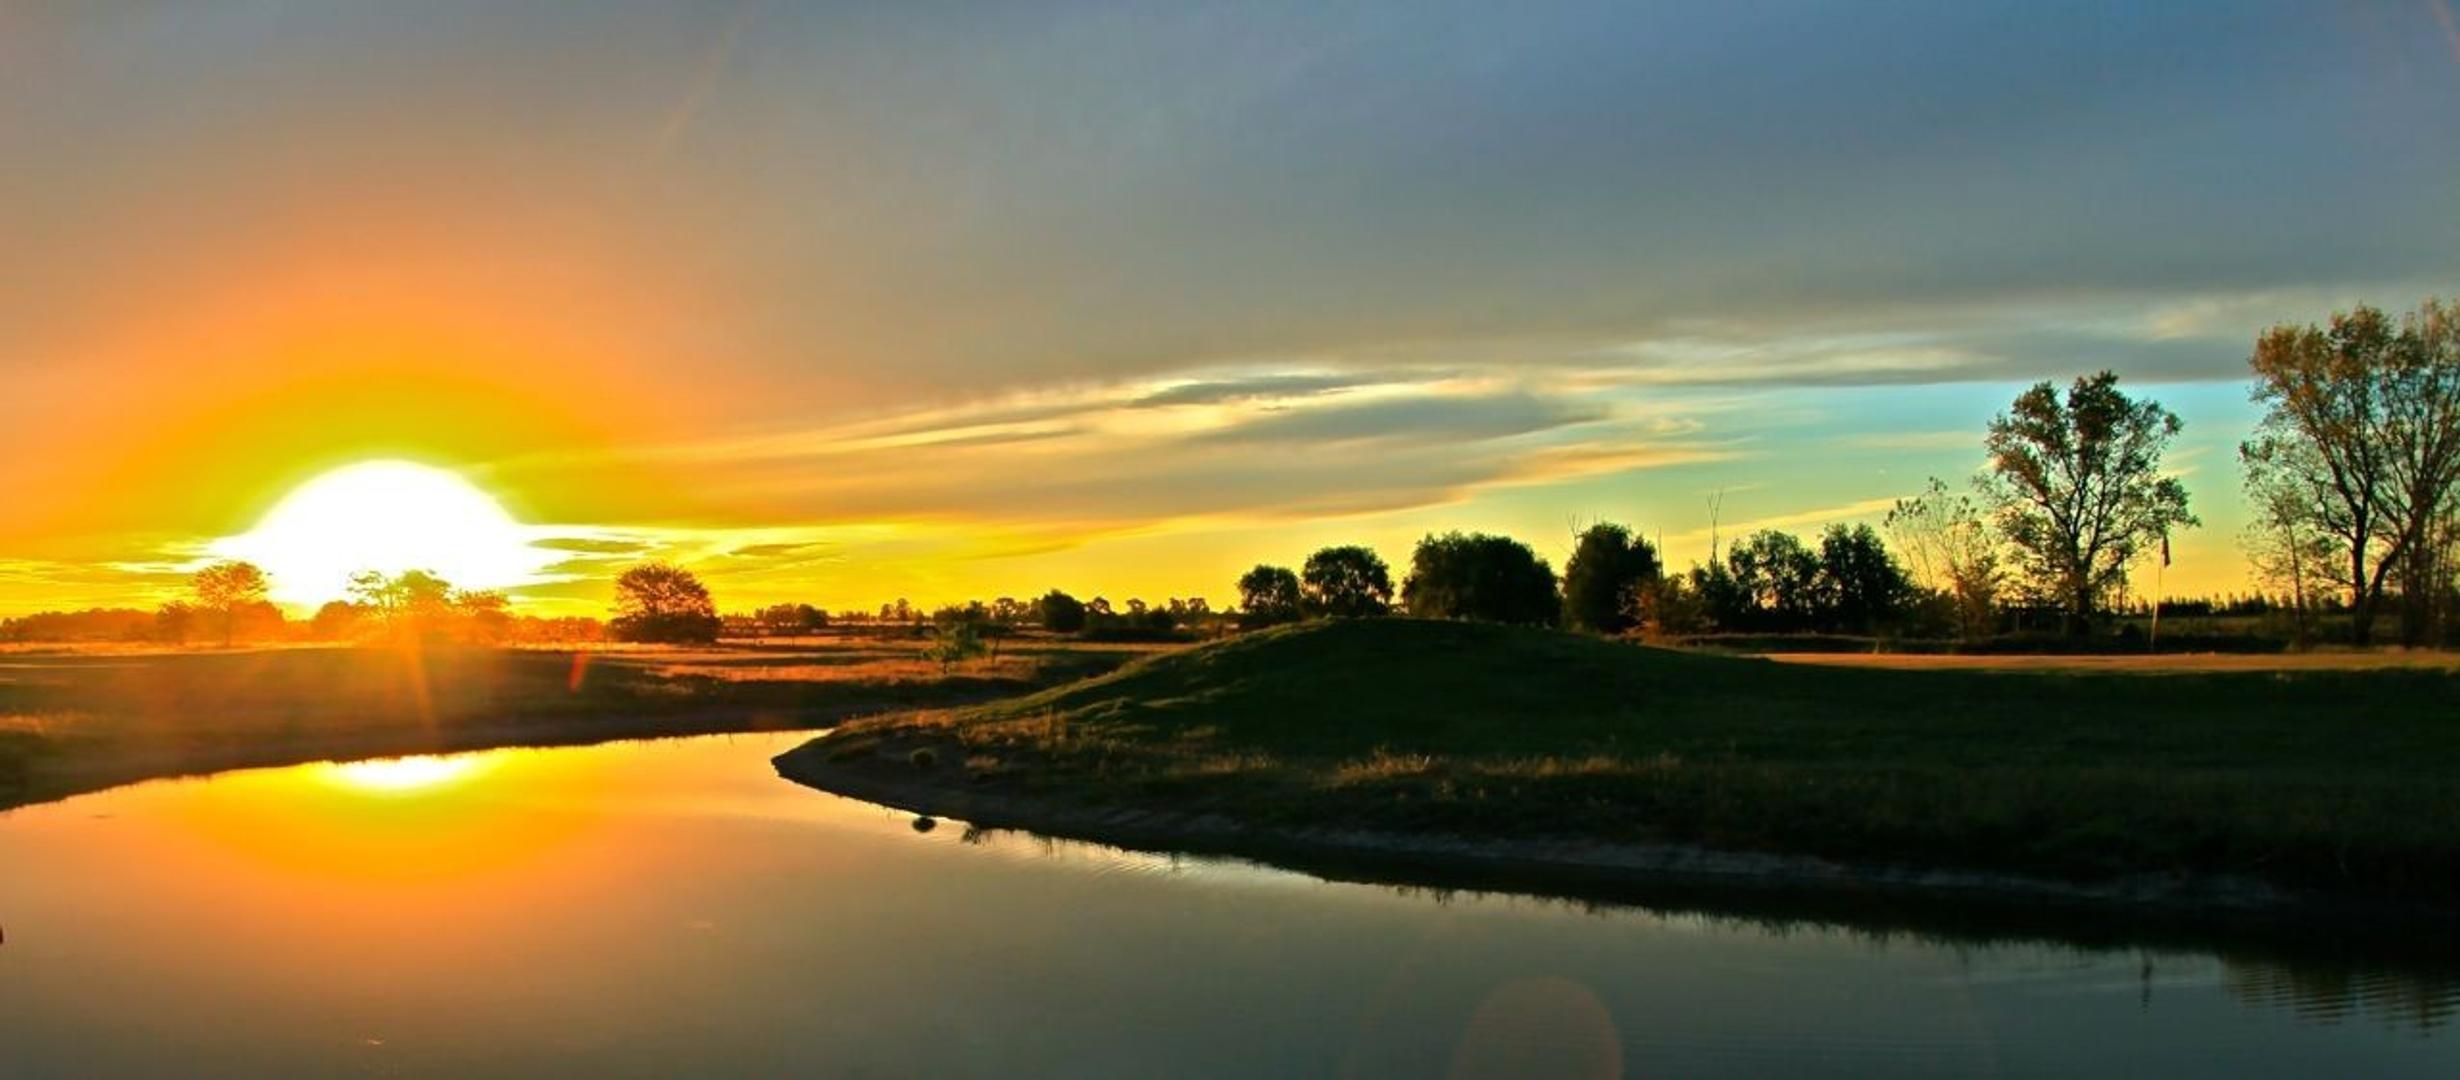 Tizado Pilar vende lotes al golf en Medal CC, Pilar y Alrededores - PIL3849_LP172608_1